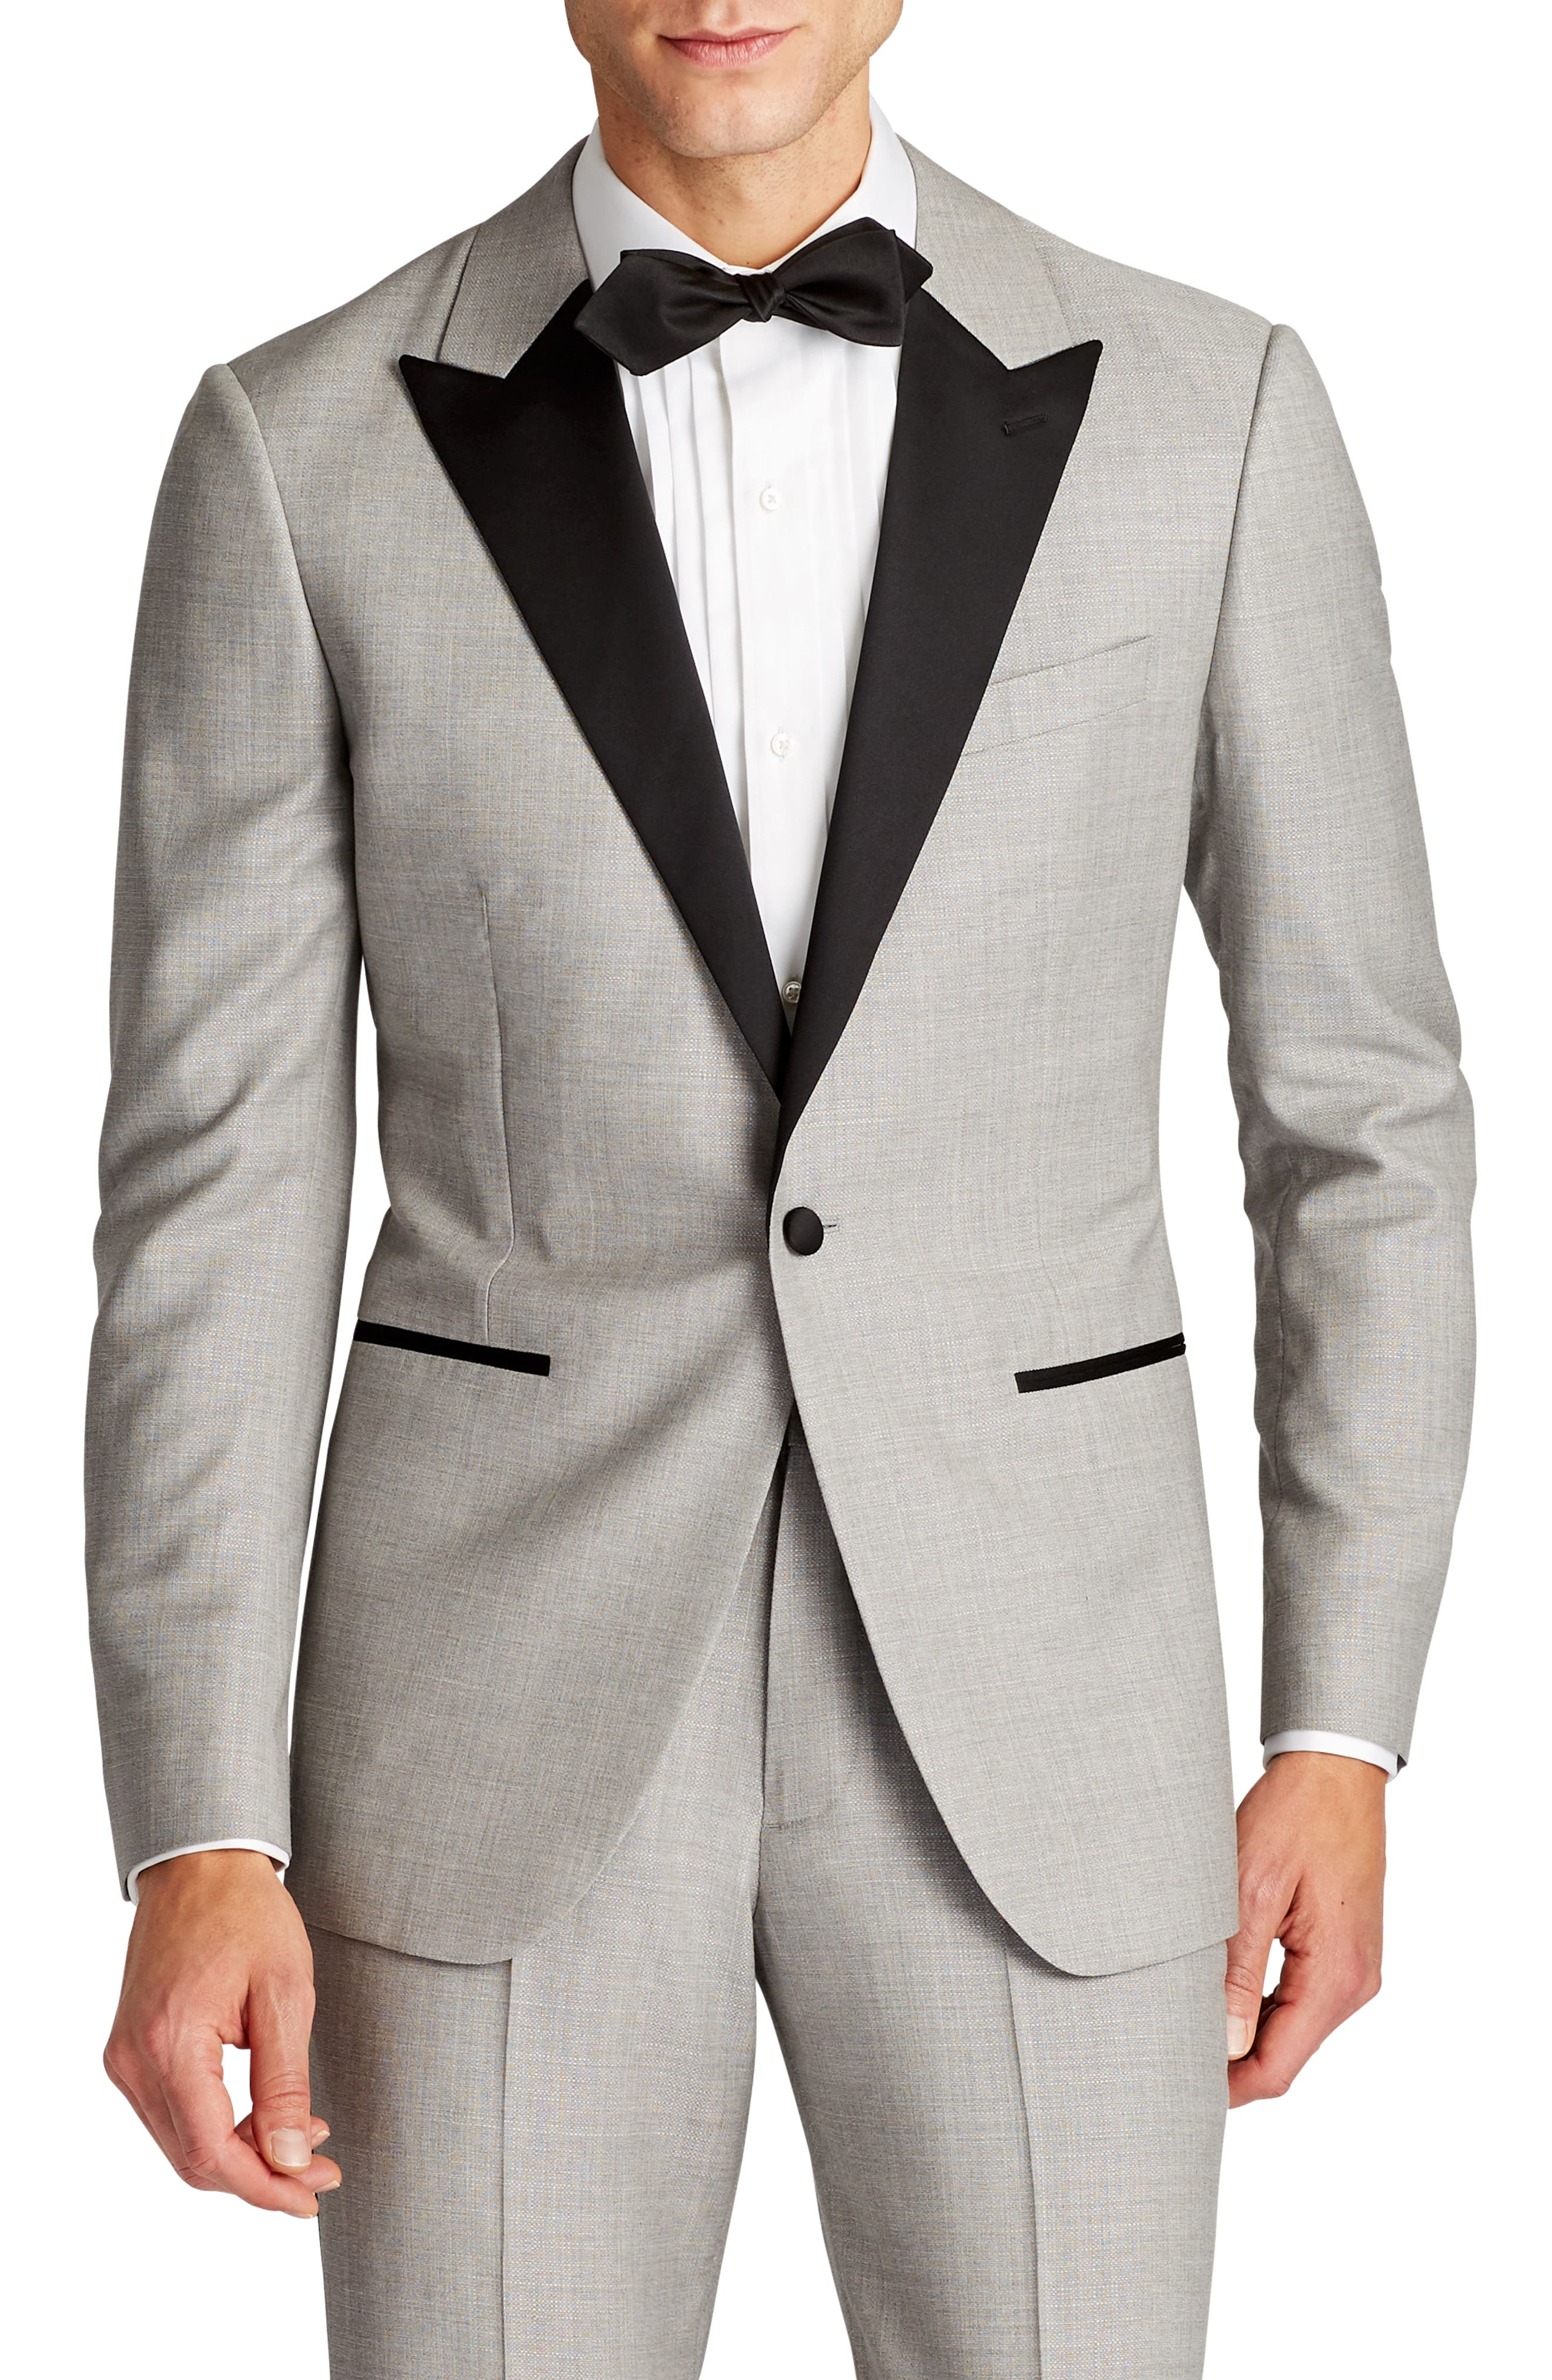 Capstone Slim Fit Wool Dinner Jacket,                         Main,                         color, 020